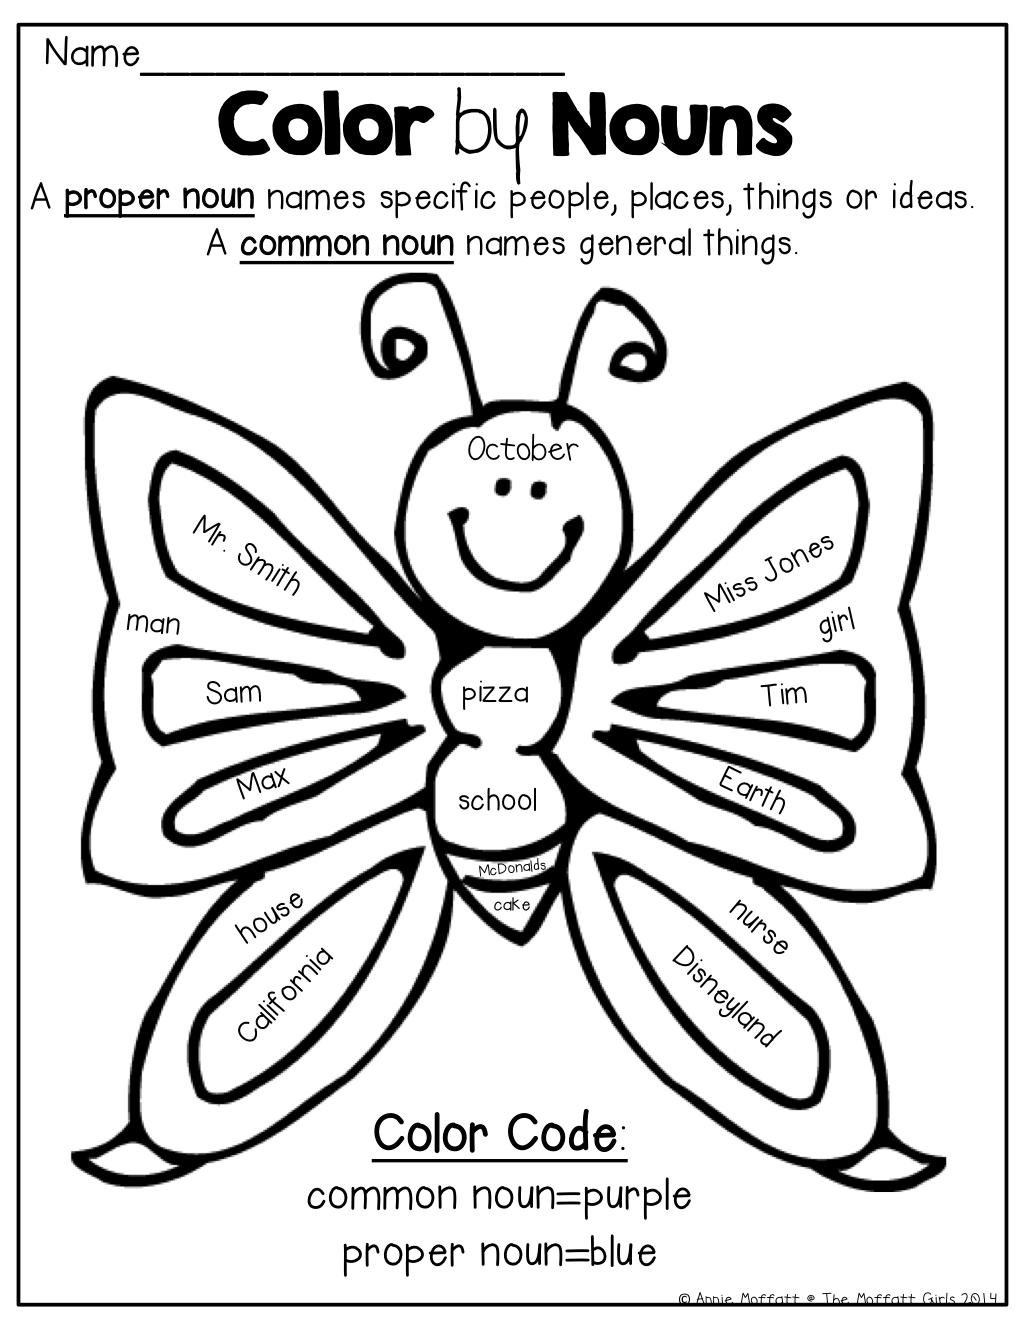 Spring Math And Literacy Packet No Prep 1st Grade Proper Nouns